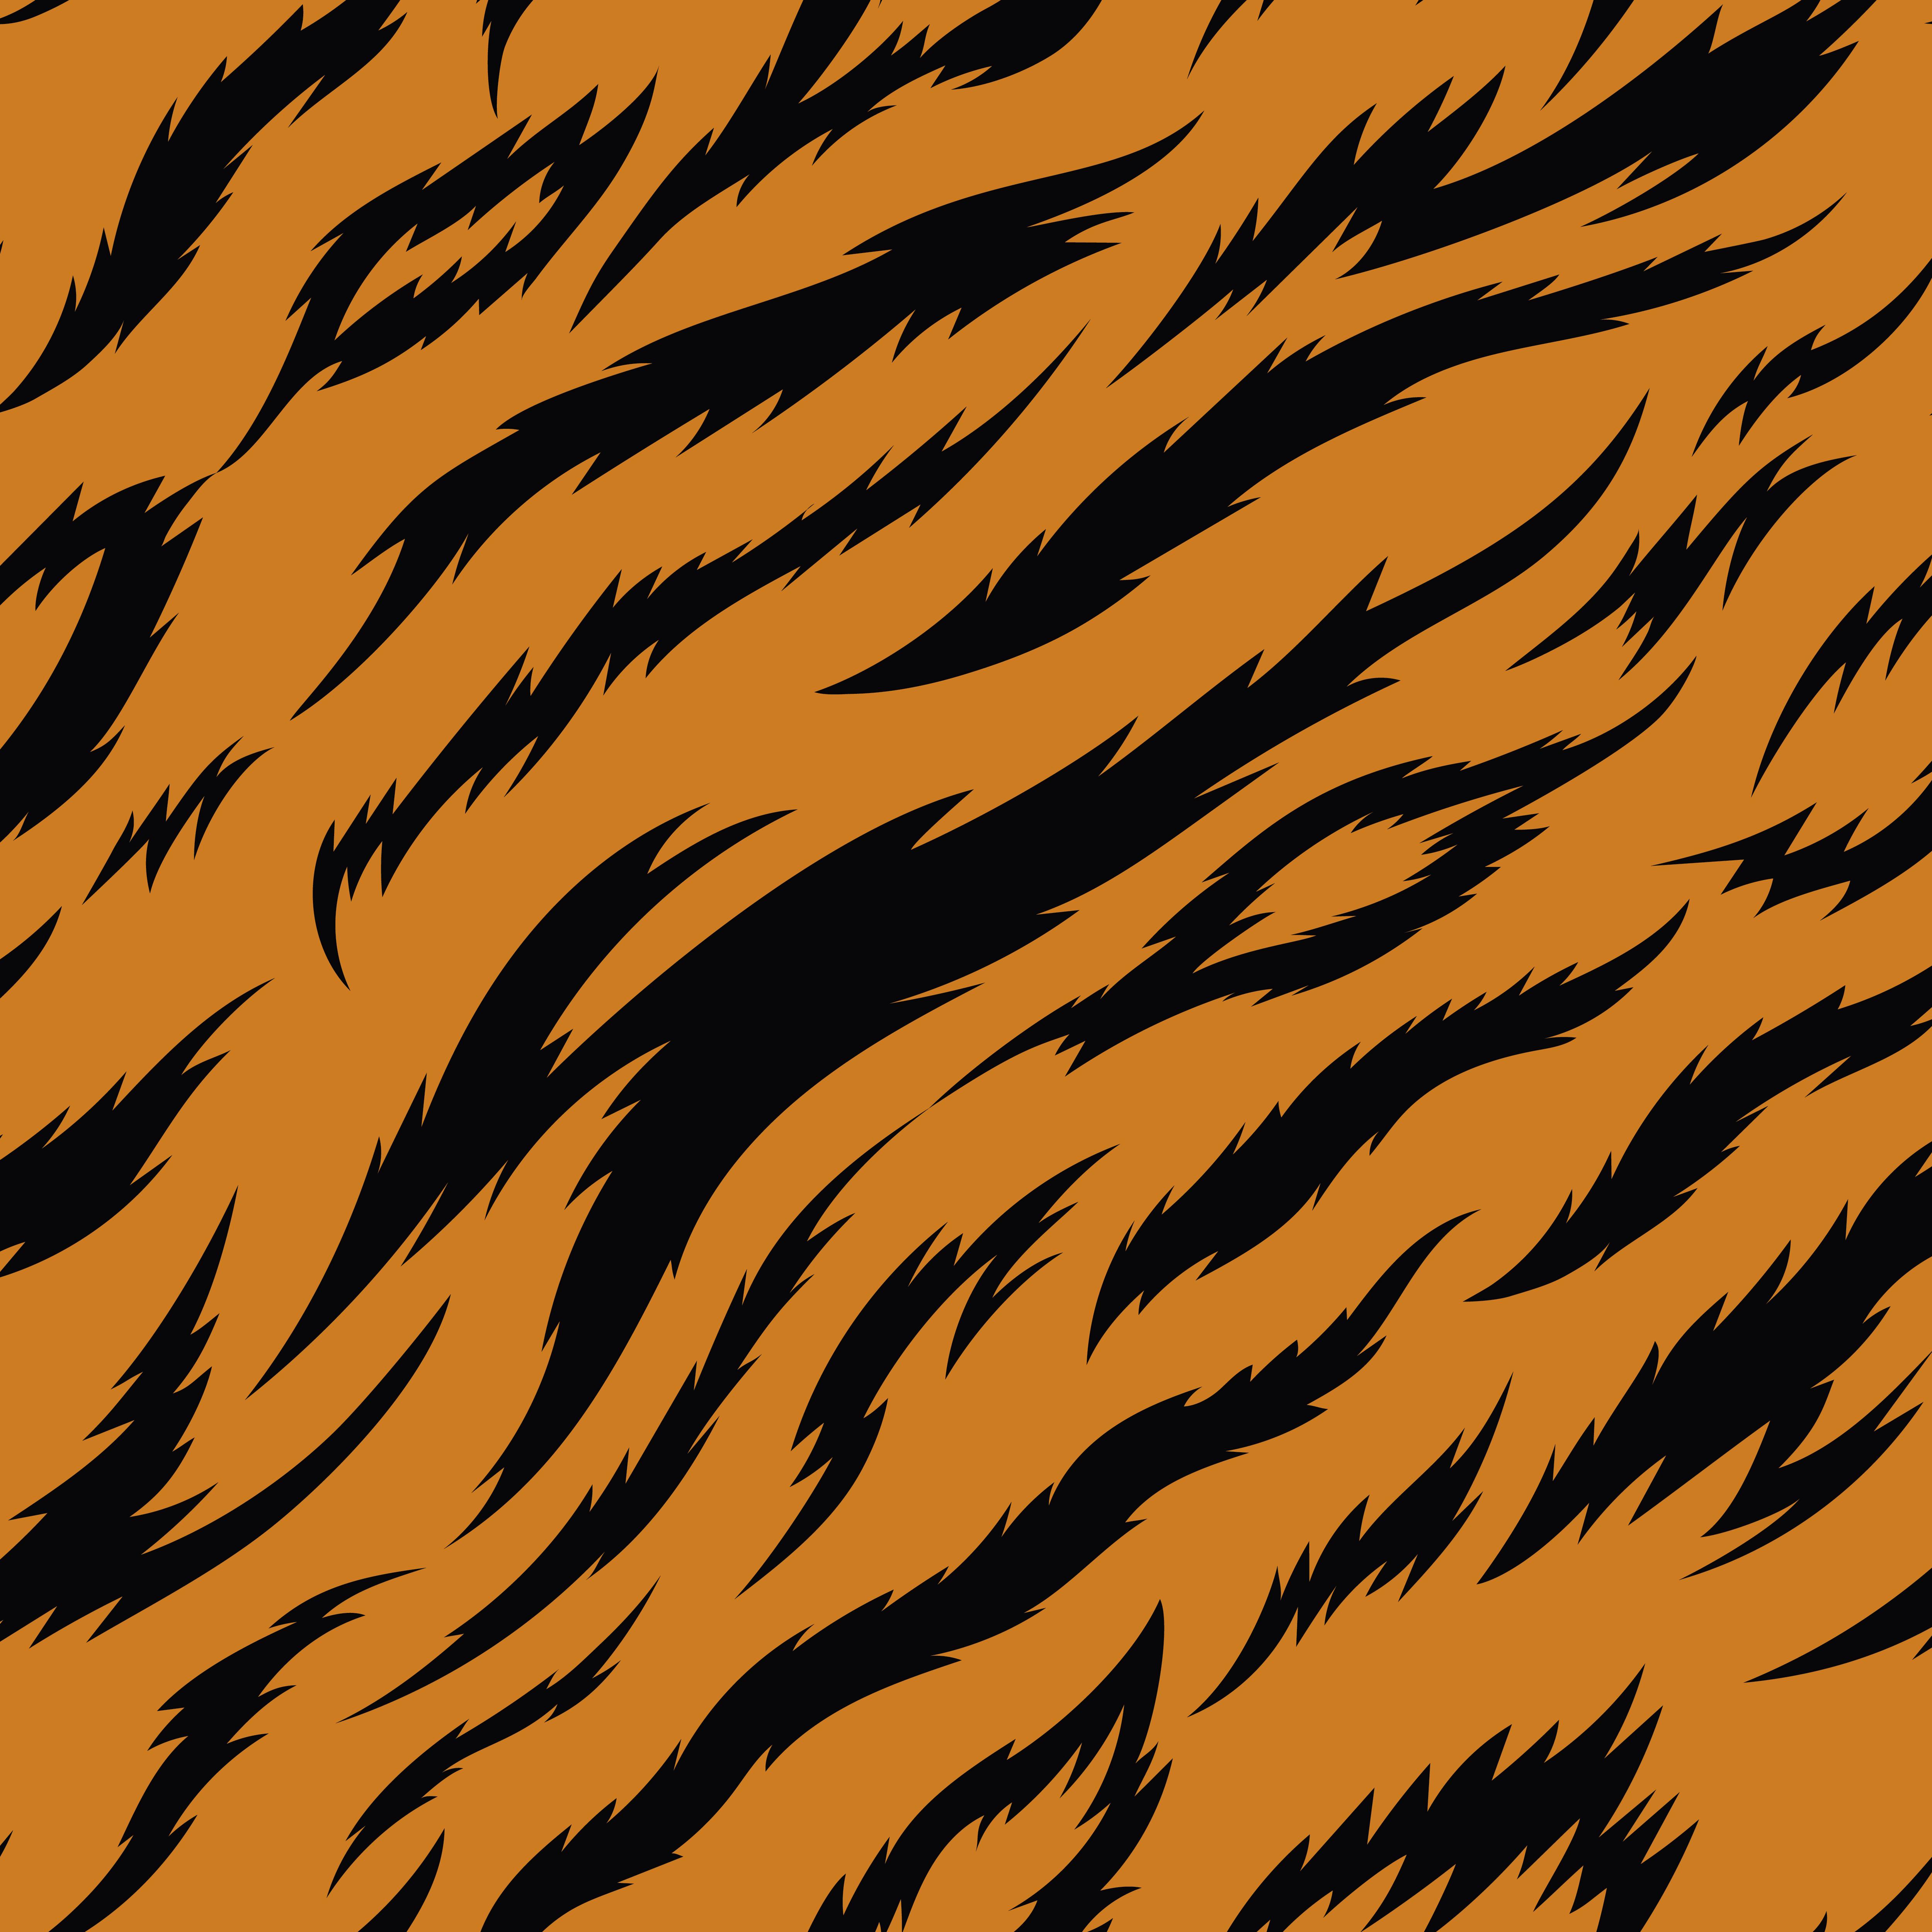 Padrao De Vetor Sem Emenda De Listras De Tigre Download Vetores